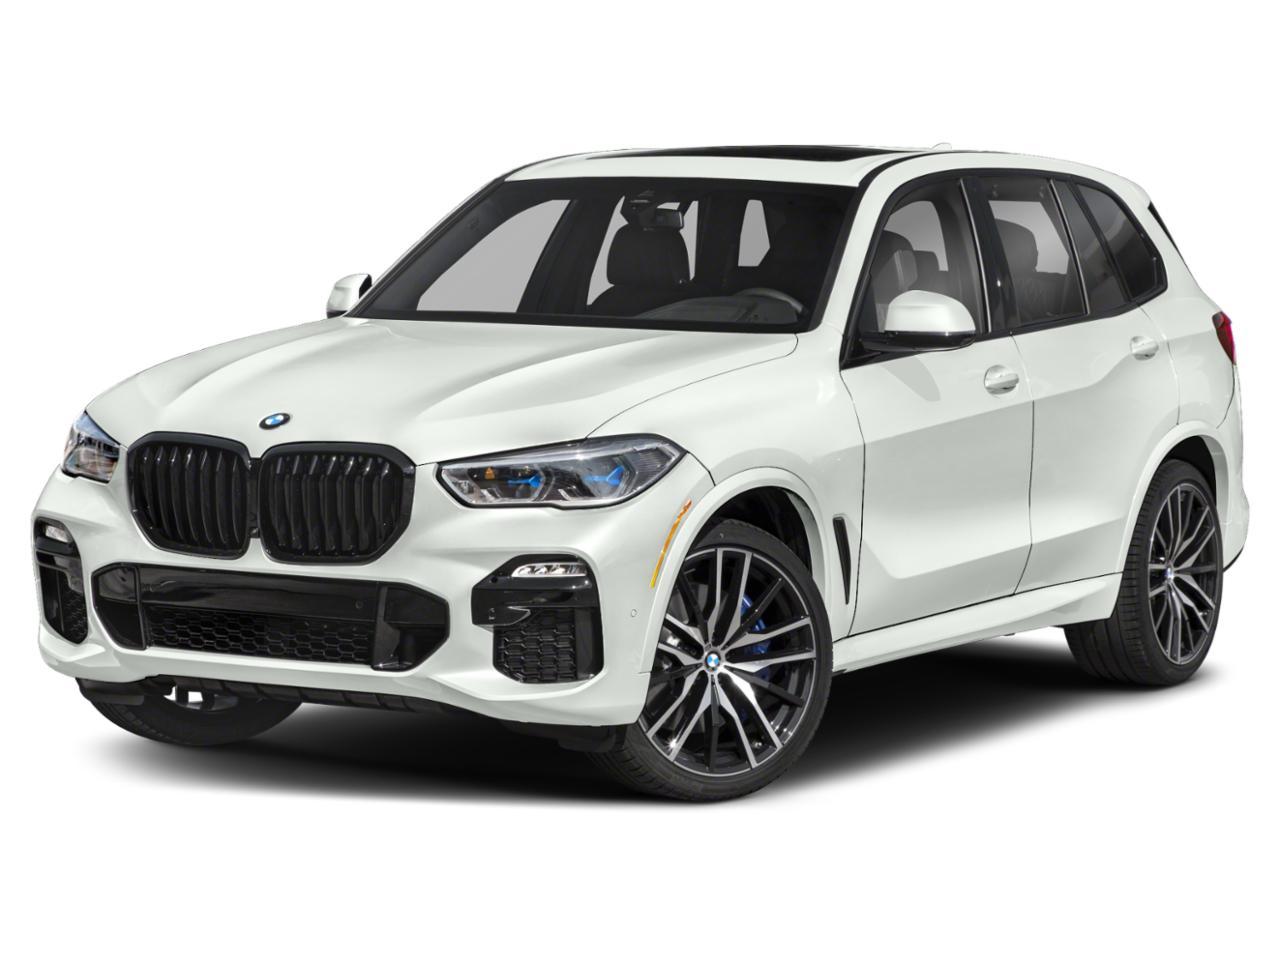 2021 BMW X5 M50i Vehicle Photo in Grapevine, TX 76051